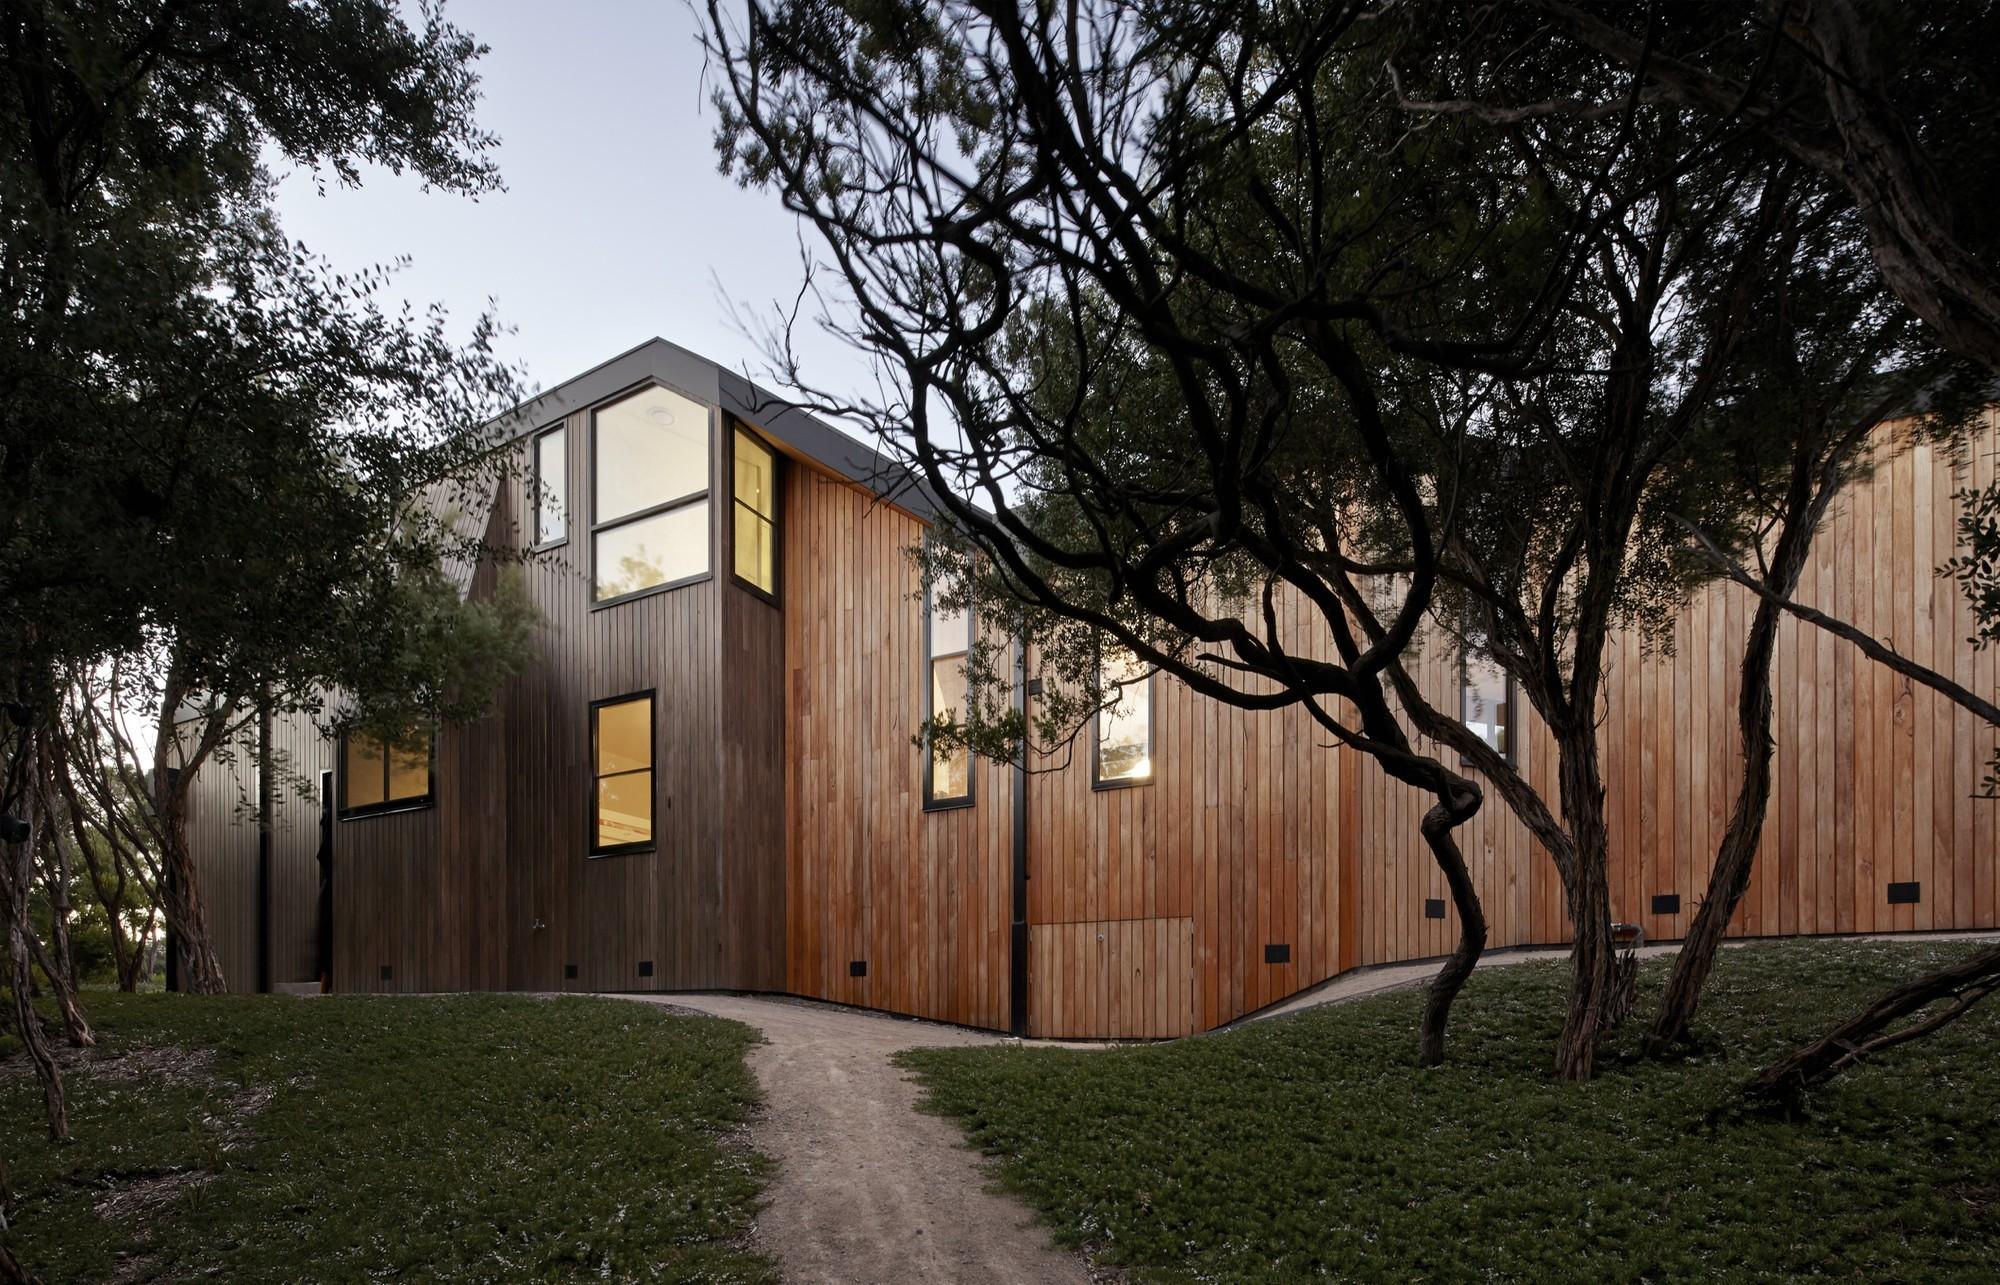 Holiday House / BKK Architects, © Peter Bennetts